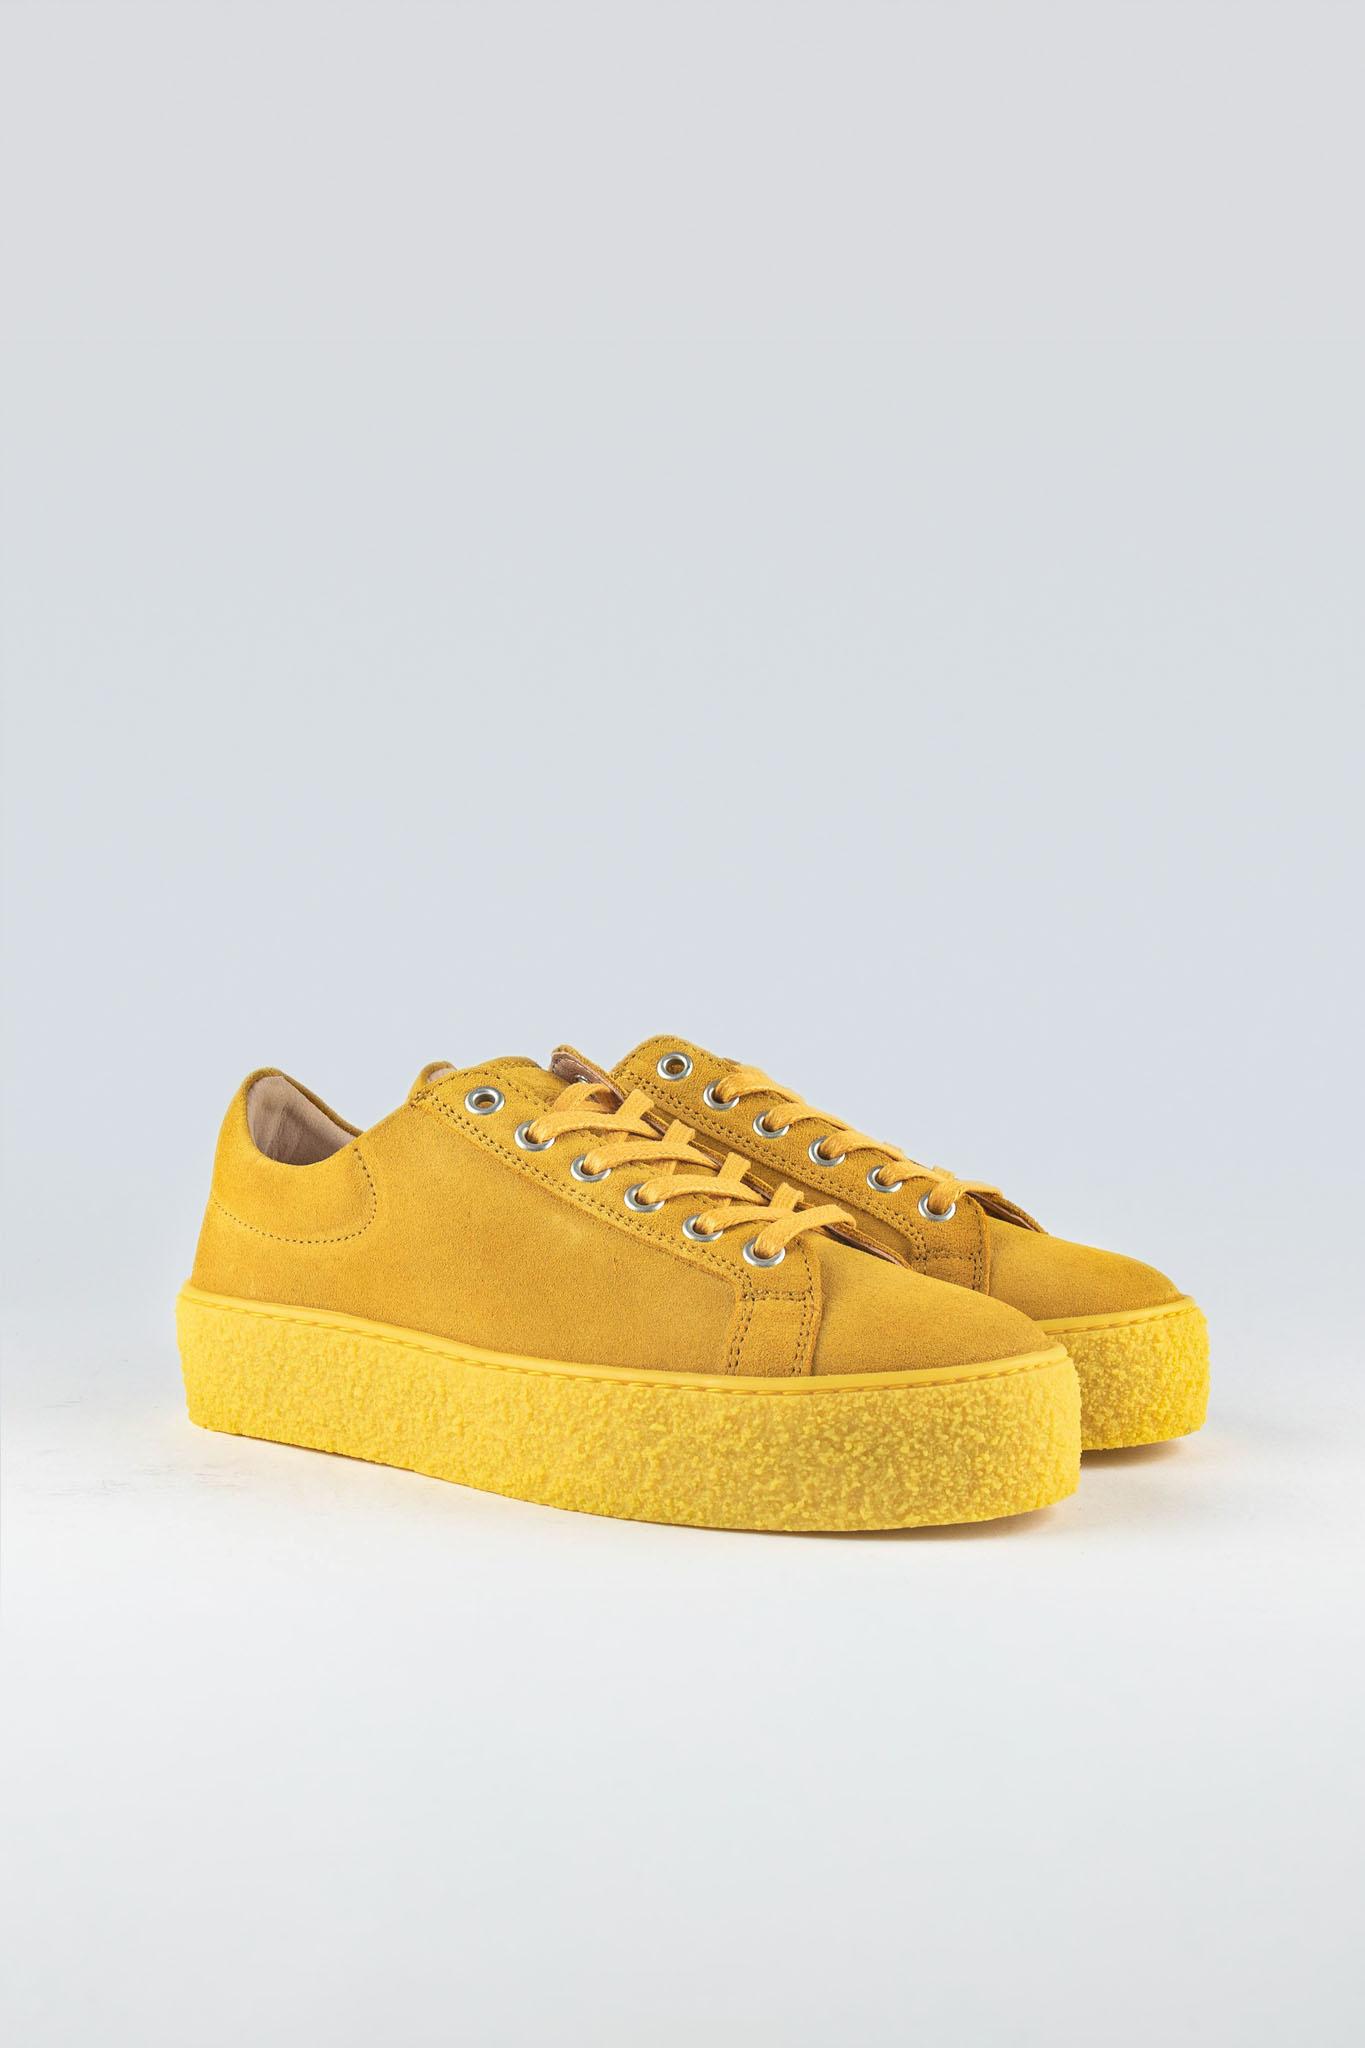 Sidder W Yellow Suede